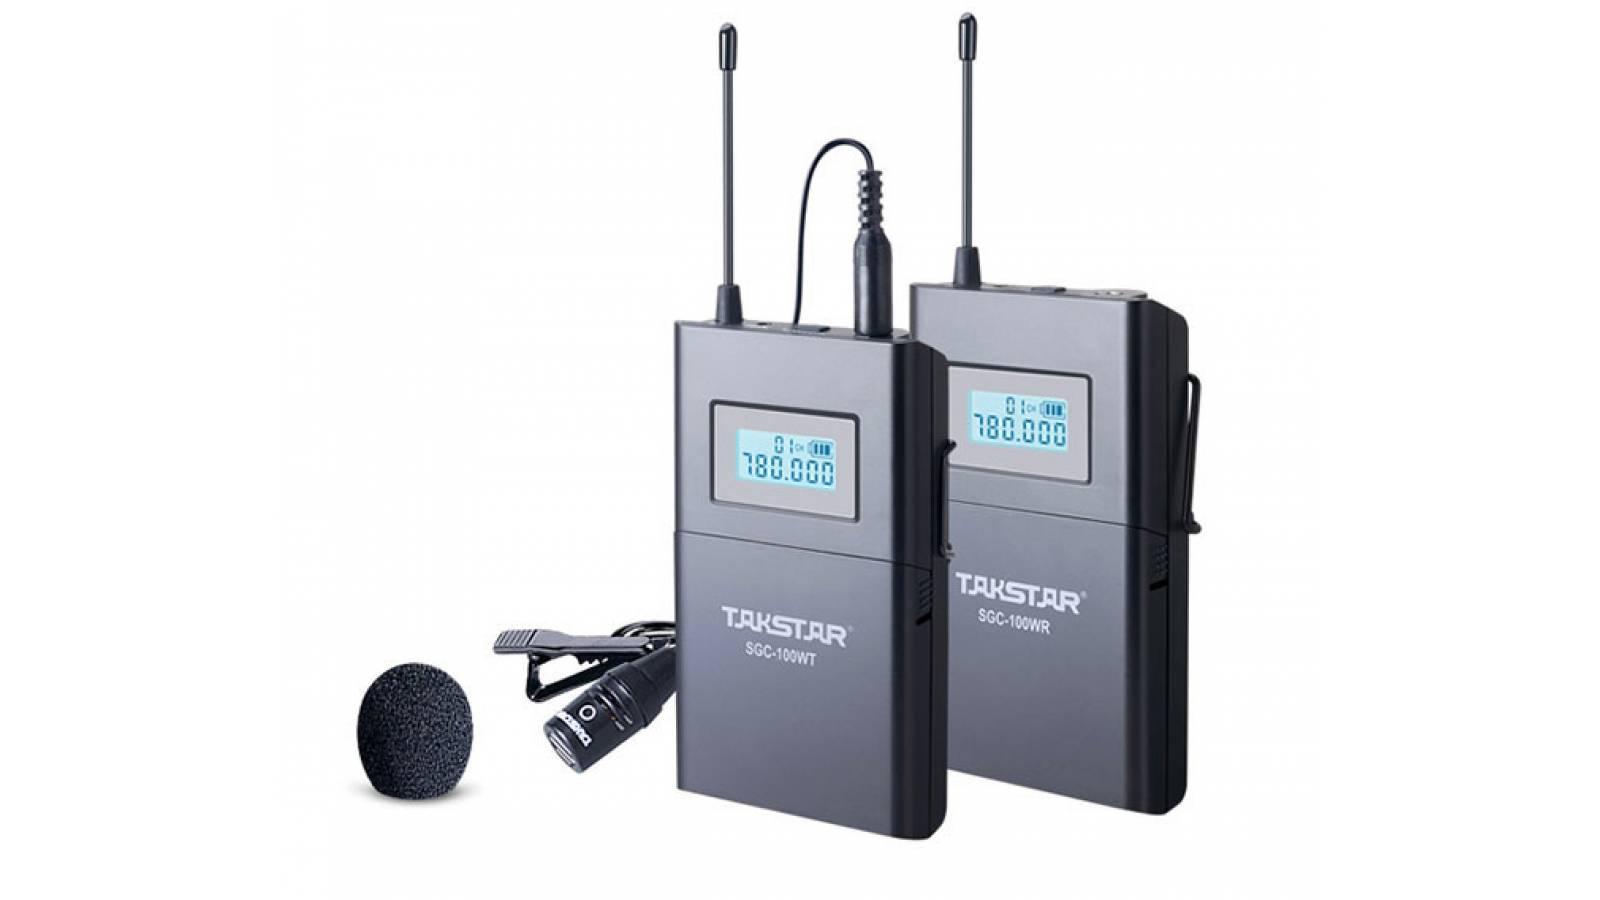 Sistema inalambrico para entrevistas solapero TAKSTAR SGC-100W